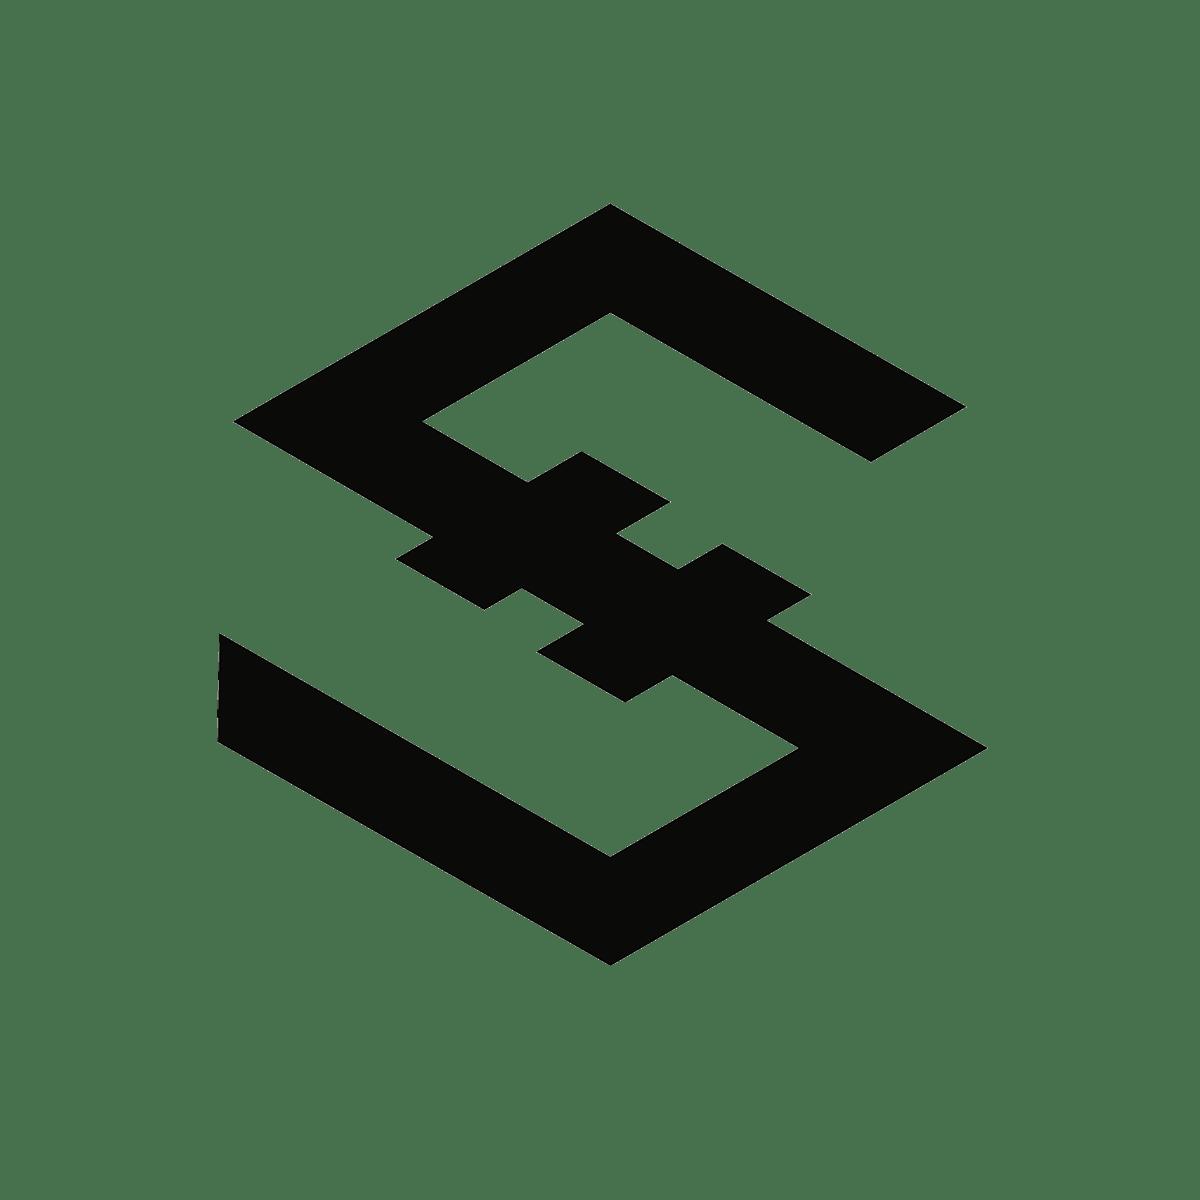 IOStoken iost logo